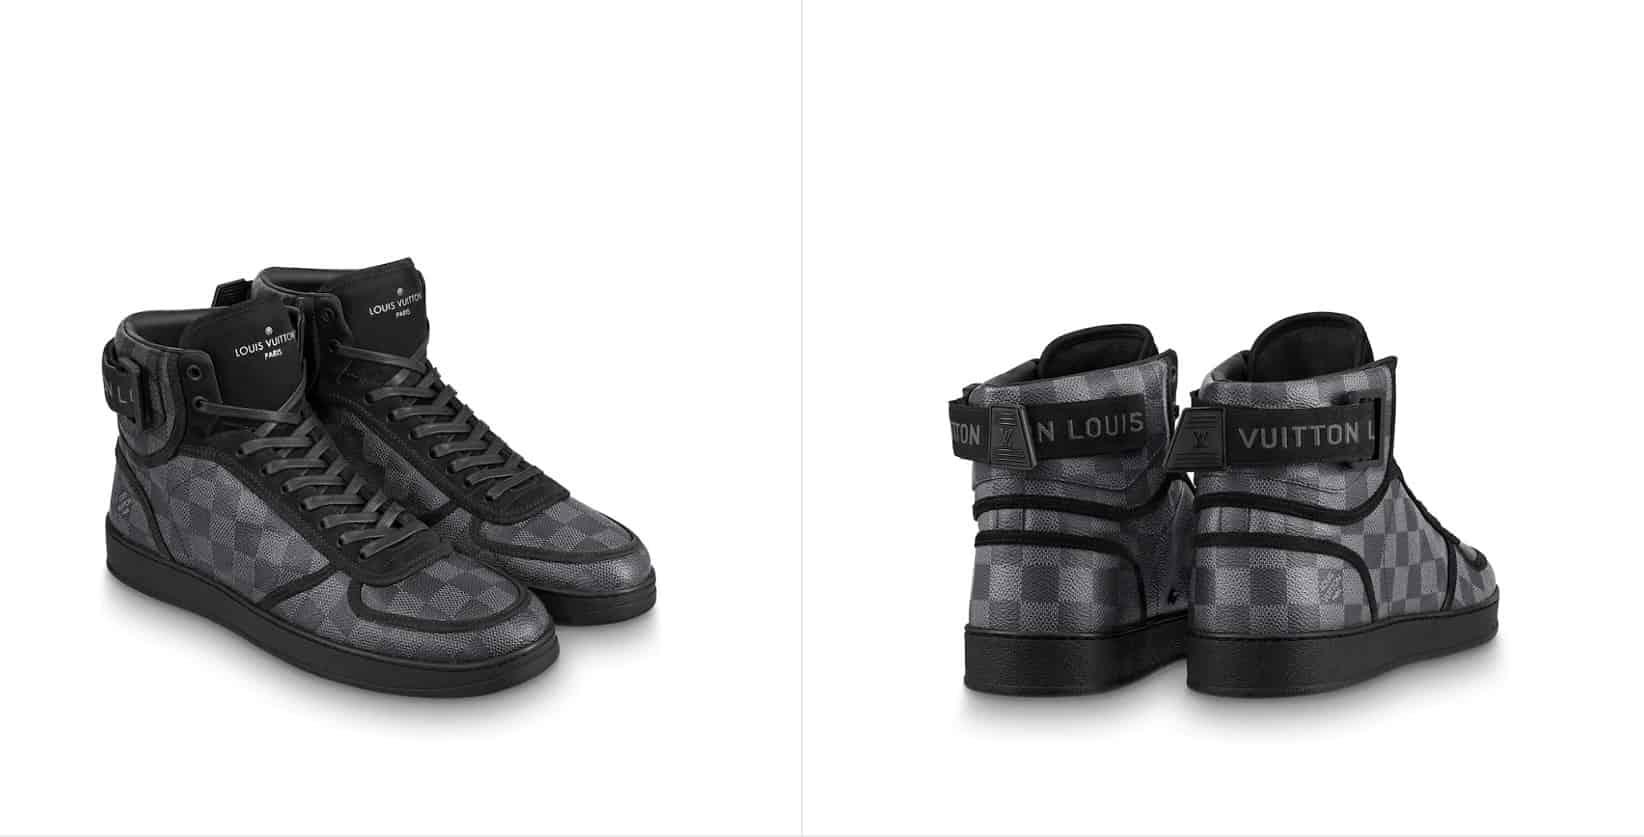 Best Fashion Brand Replica Boots Cheap Branded Copy Sneakers Fake Shoes AliExpress China Wholesale LV Louis Vuitton Rivoli Sneaker Boot